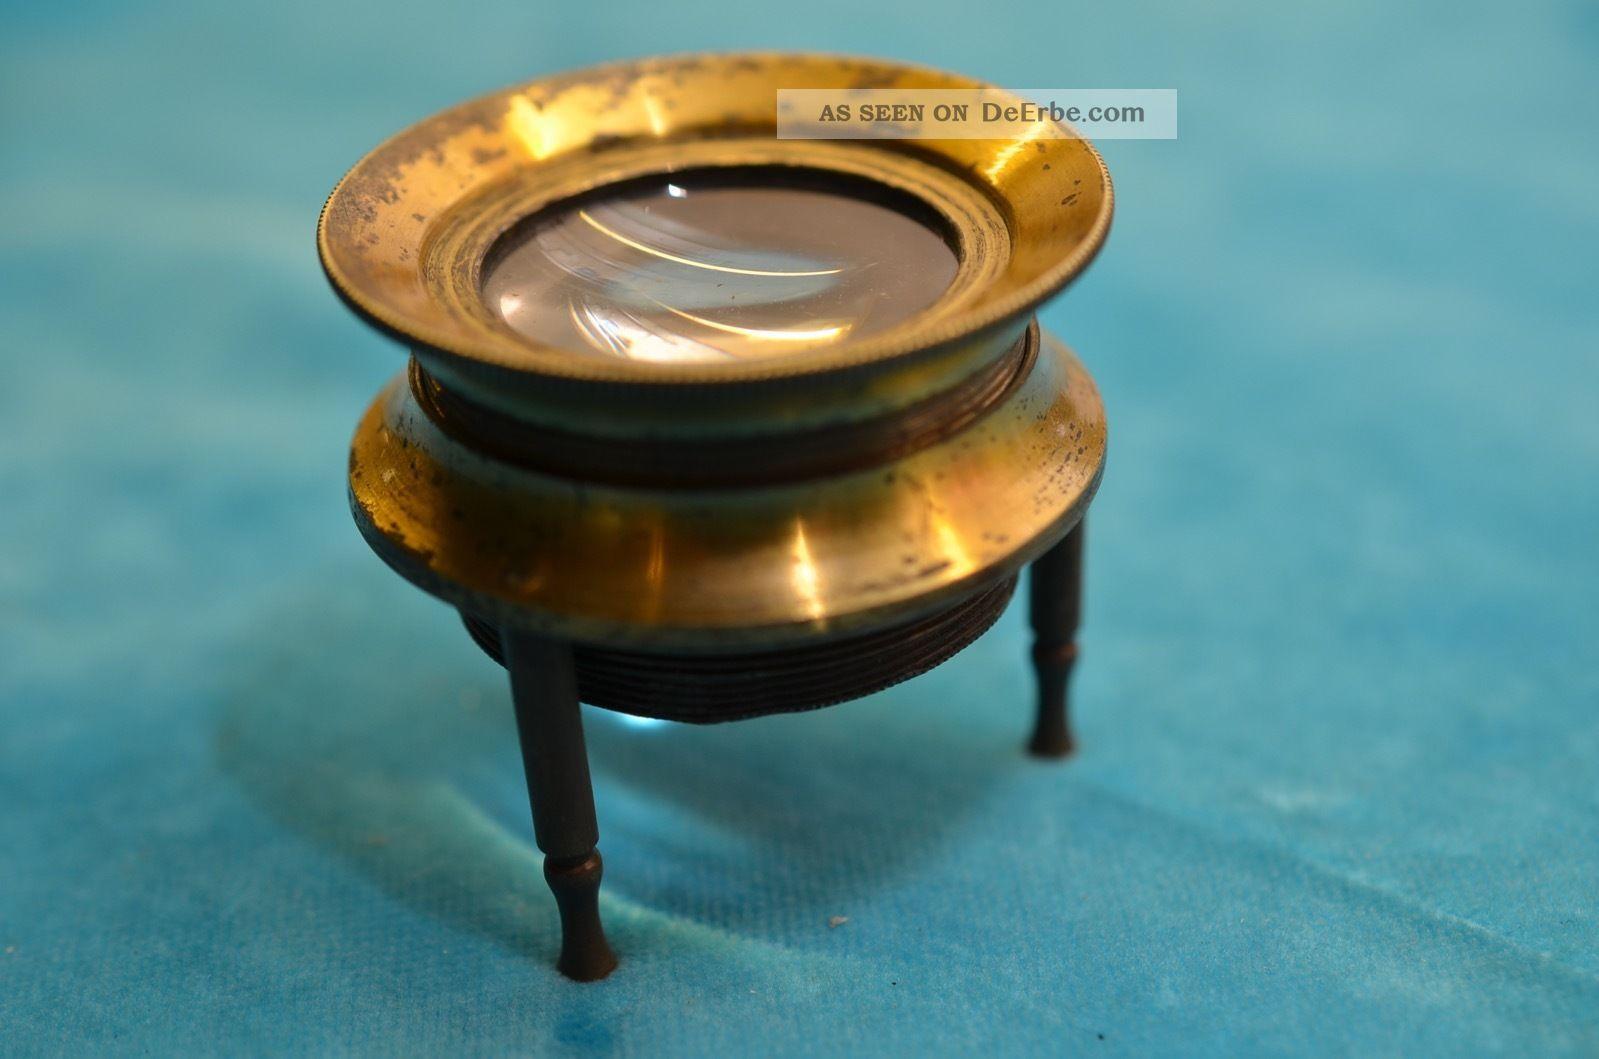 Alte Seltene Antike Lupe Standlupe Messing/kupfer Um 1900/1920 Optiker Bild